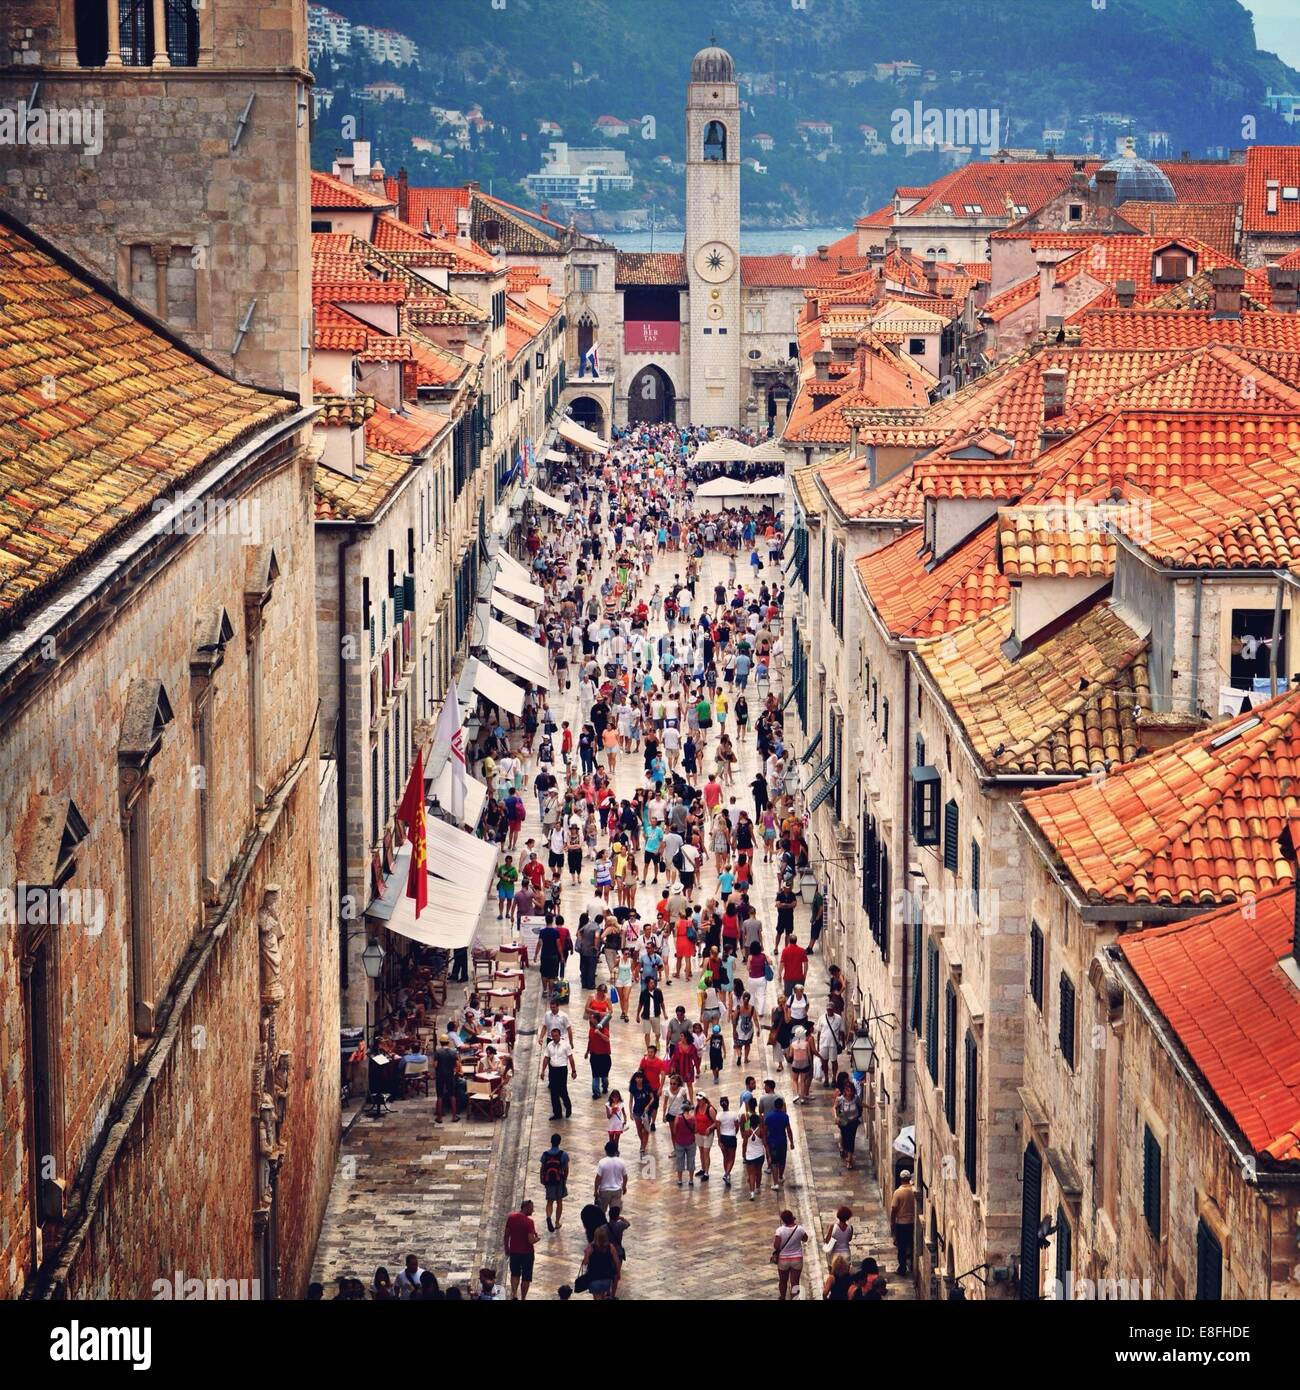 Croatia, Dubrovnik, Street full of people - Stock Image